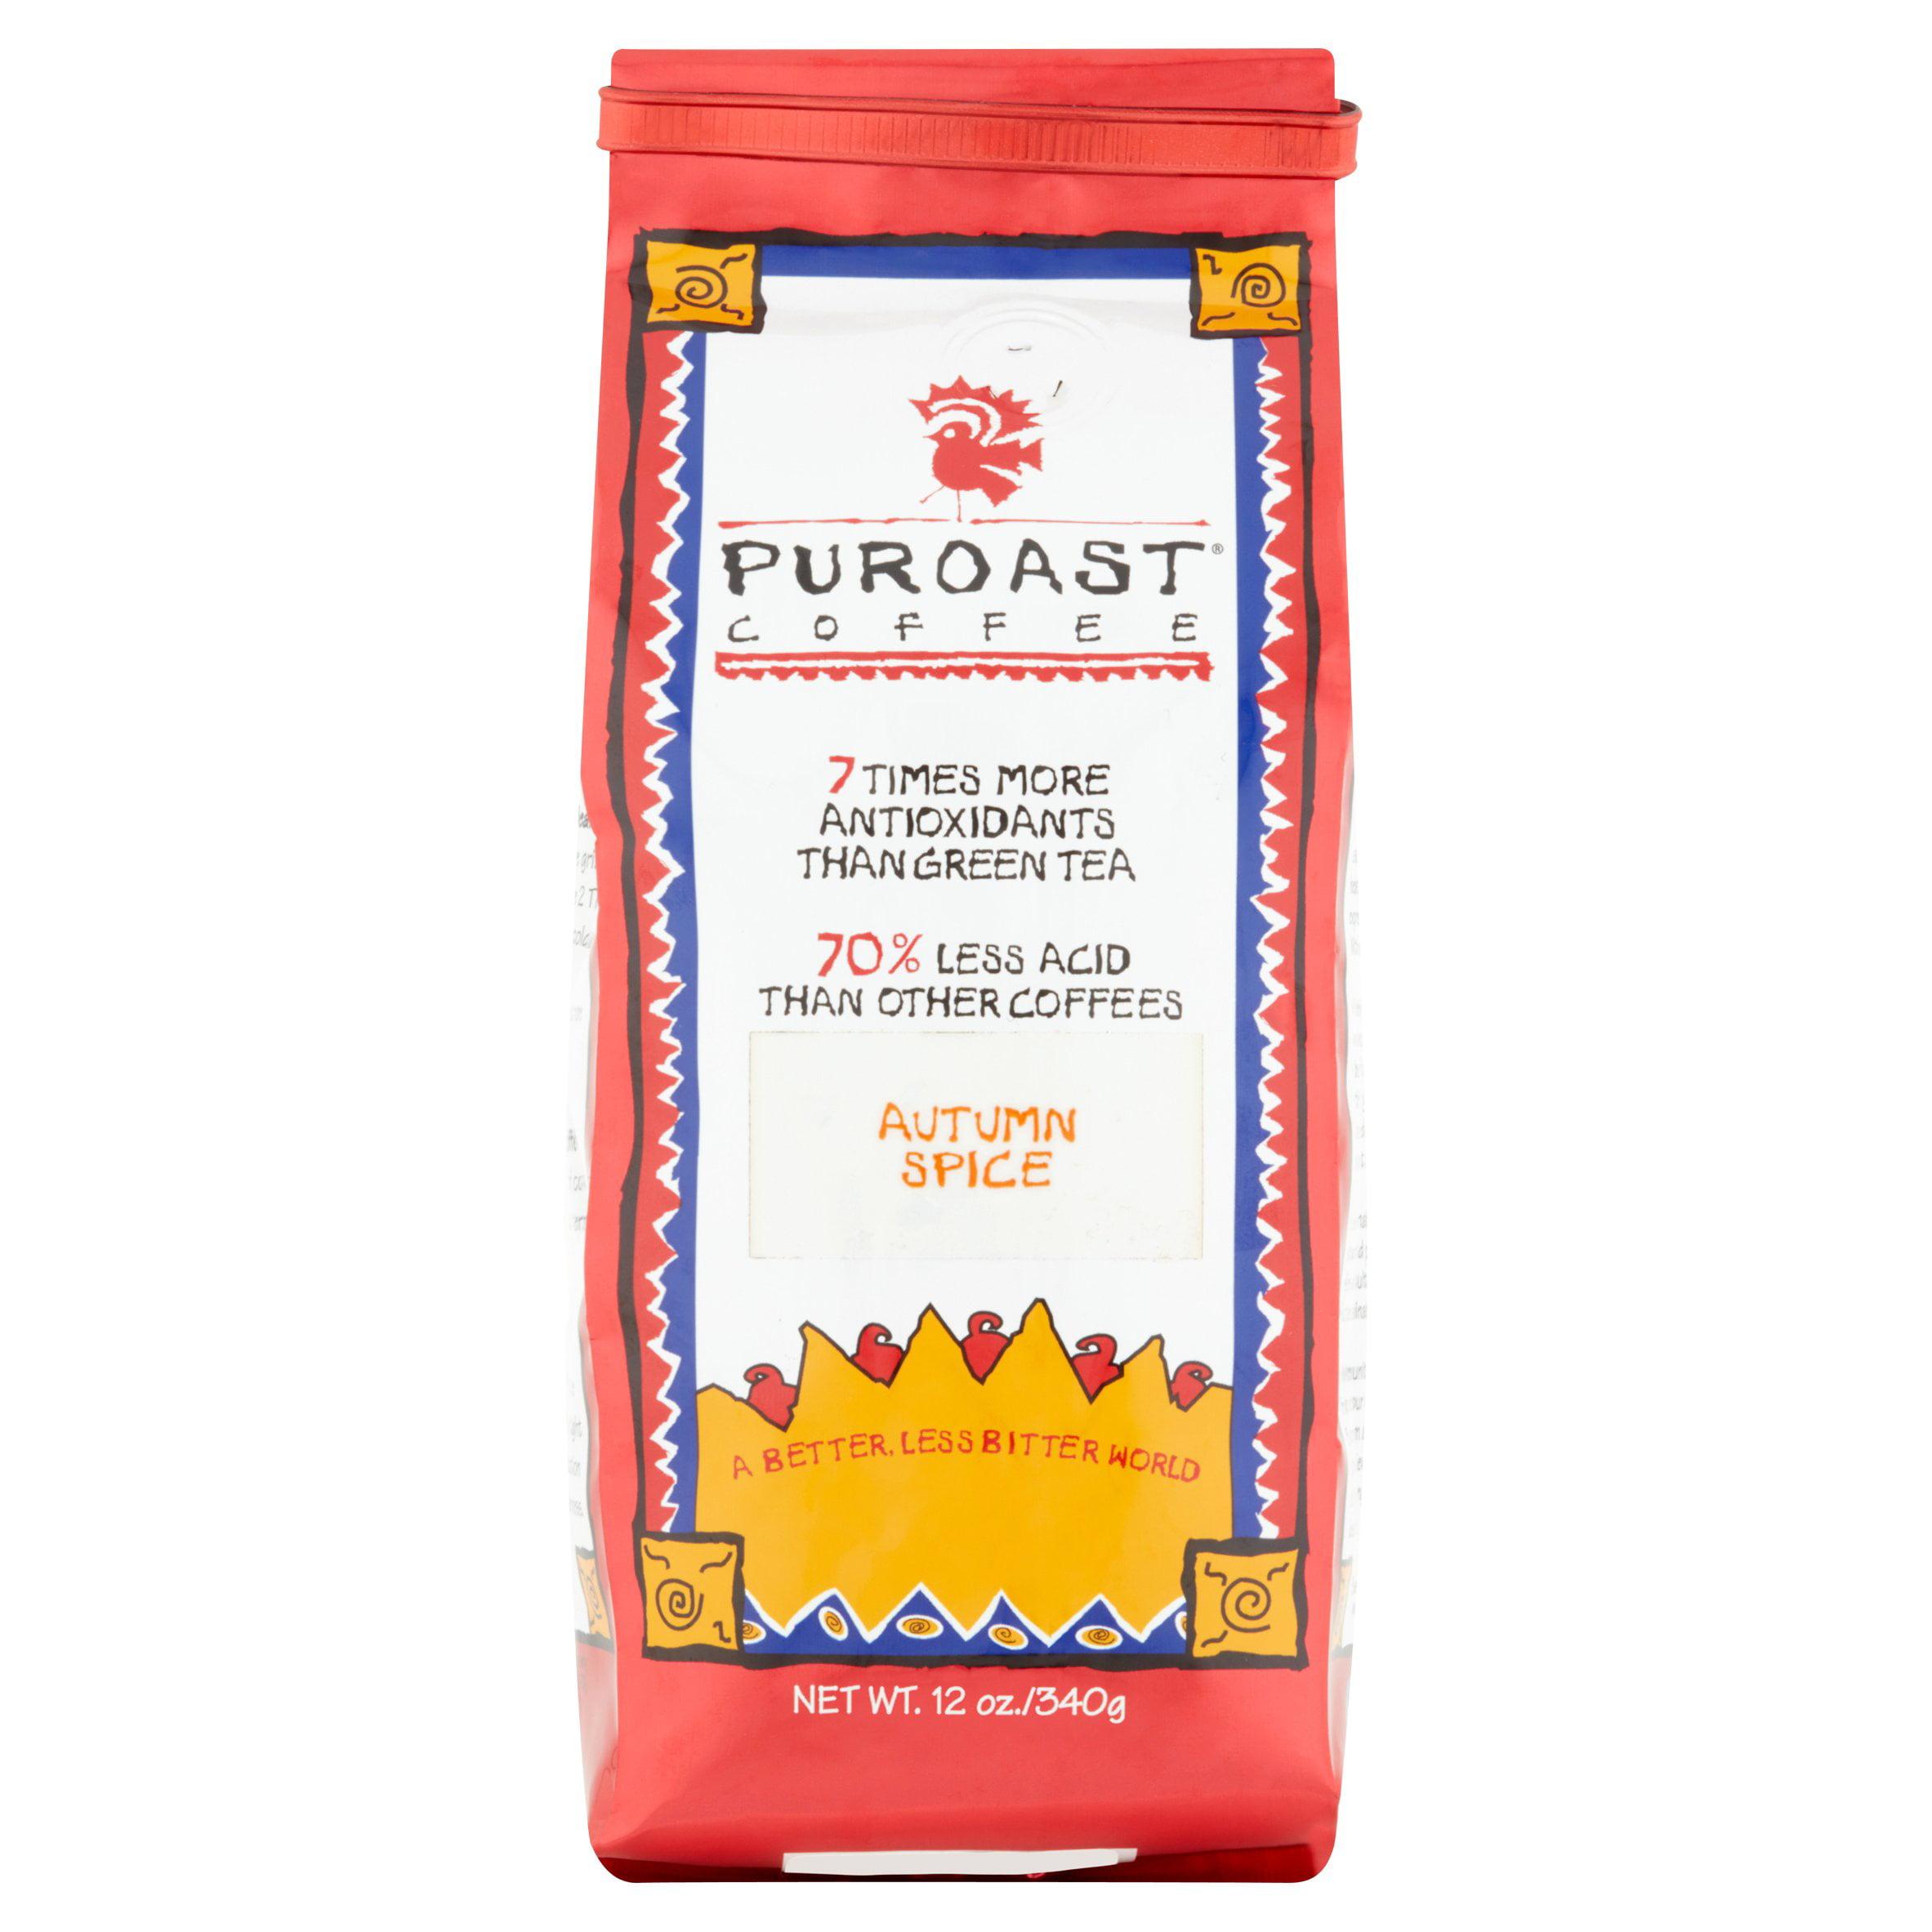 Puroast Coffee Autumn Spice, 12 oz